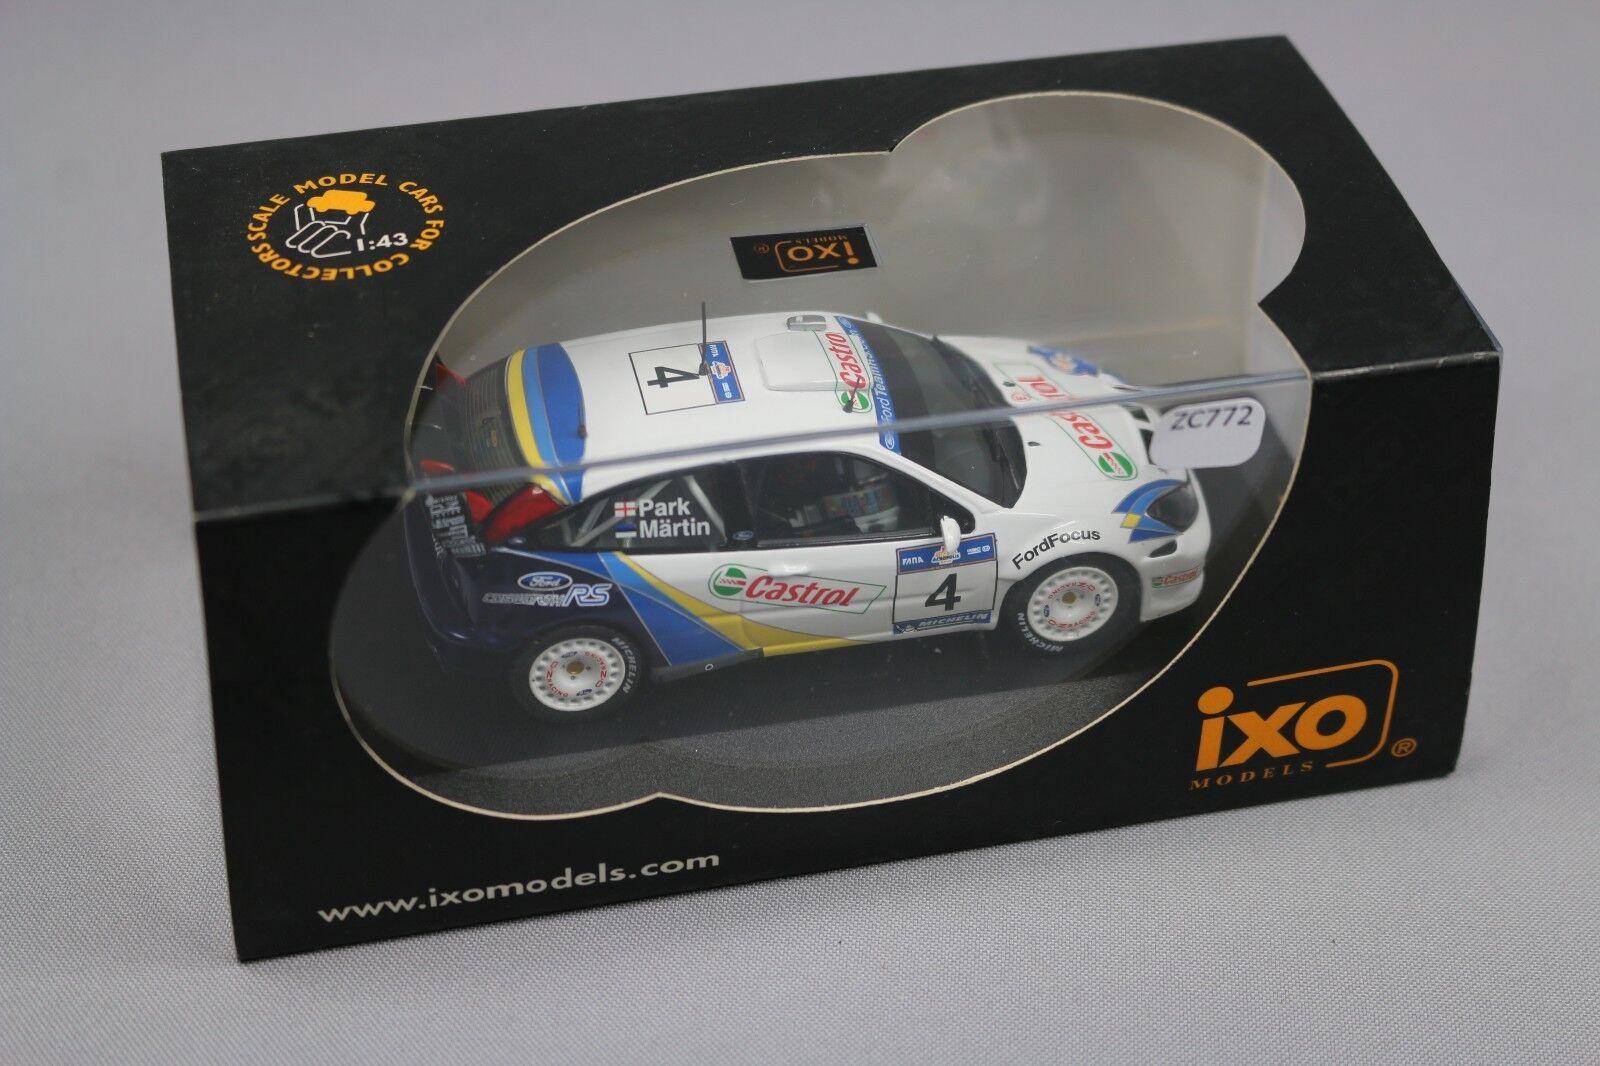 ZC772 Ixo RAM117 Miniature Voiture 1 43 Ford Focus RS Wrc Evo 3 Acropolis 2003